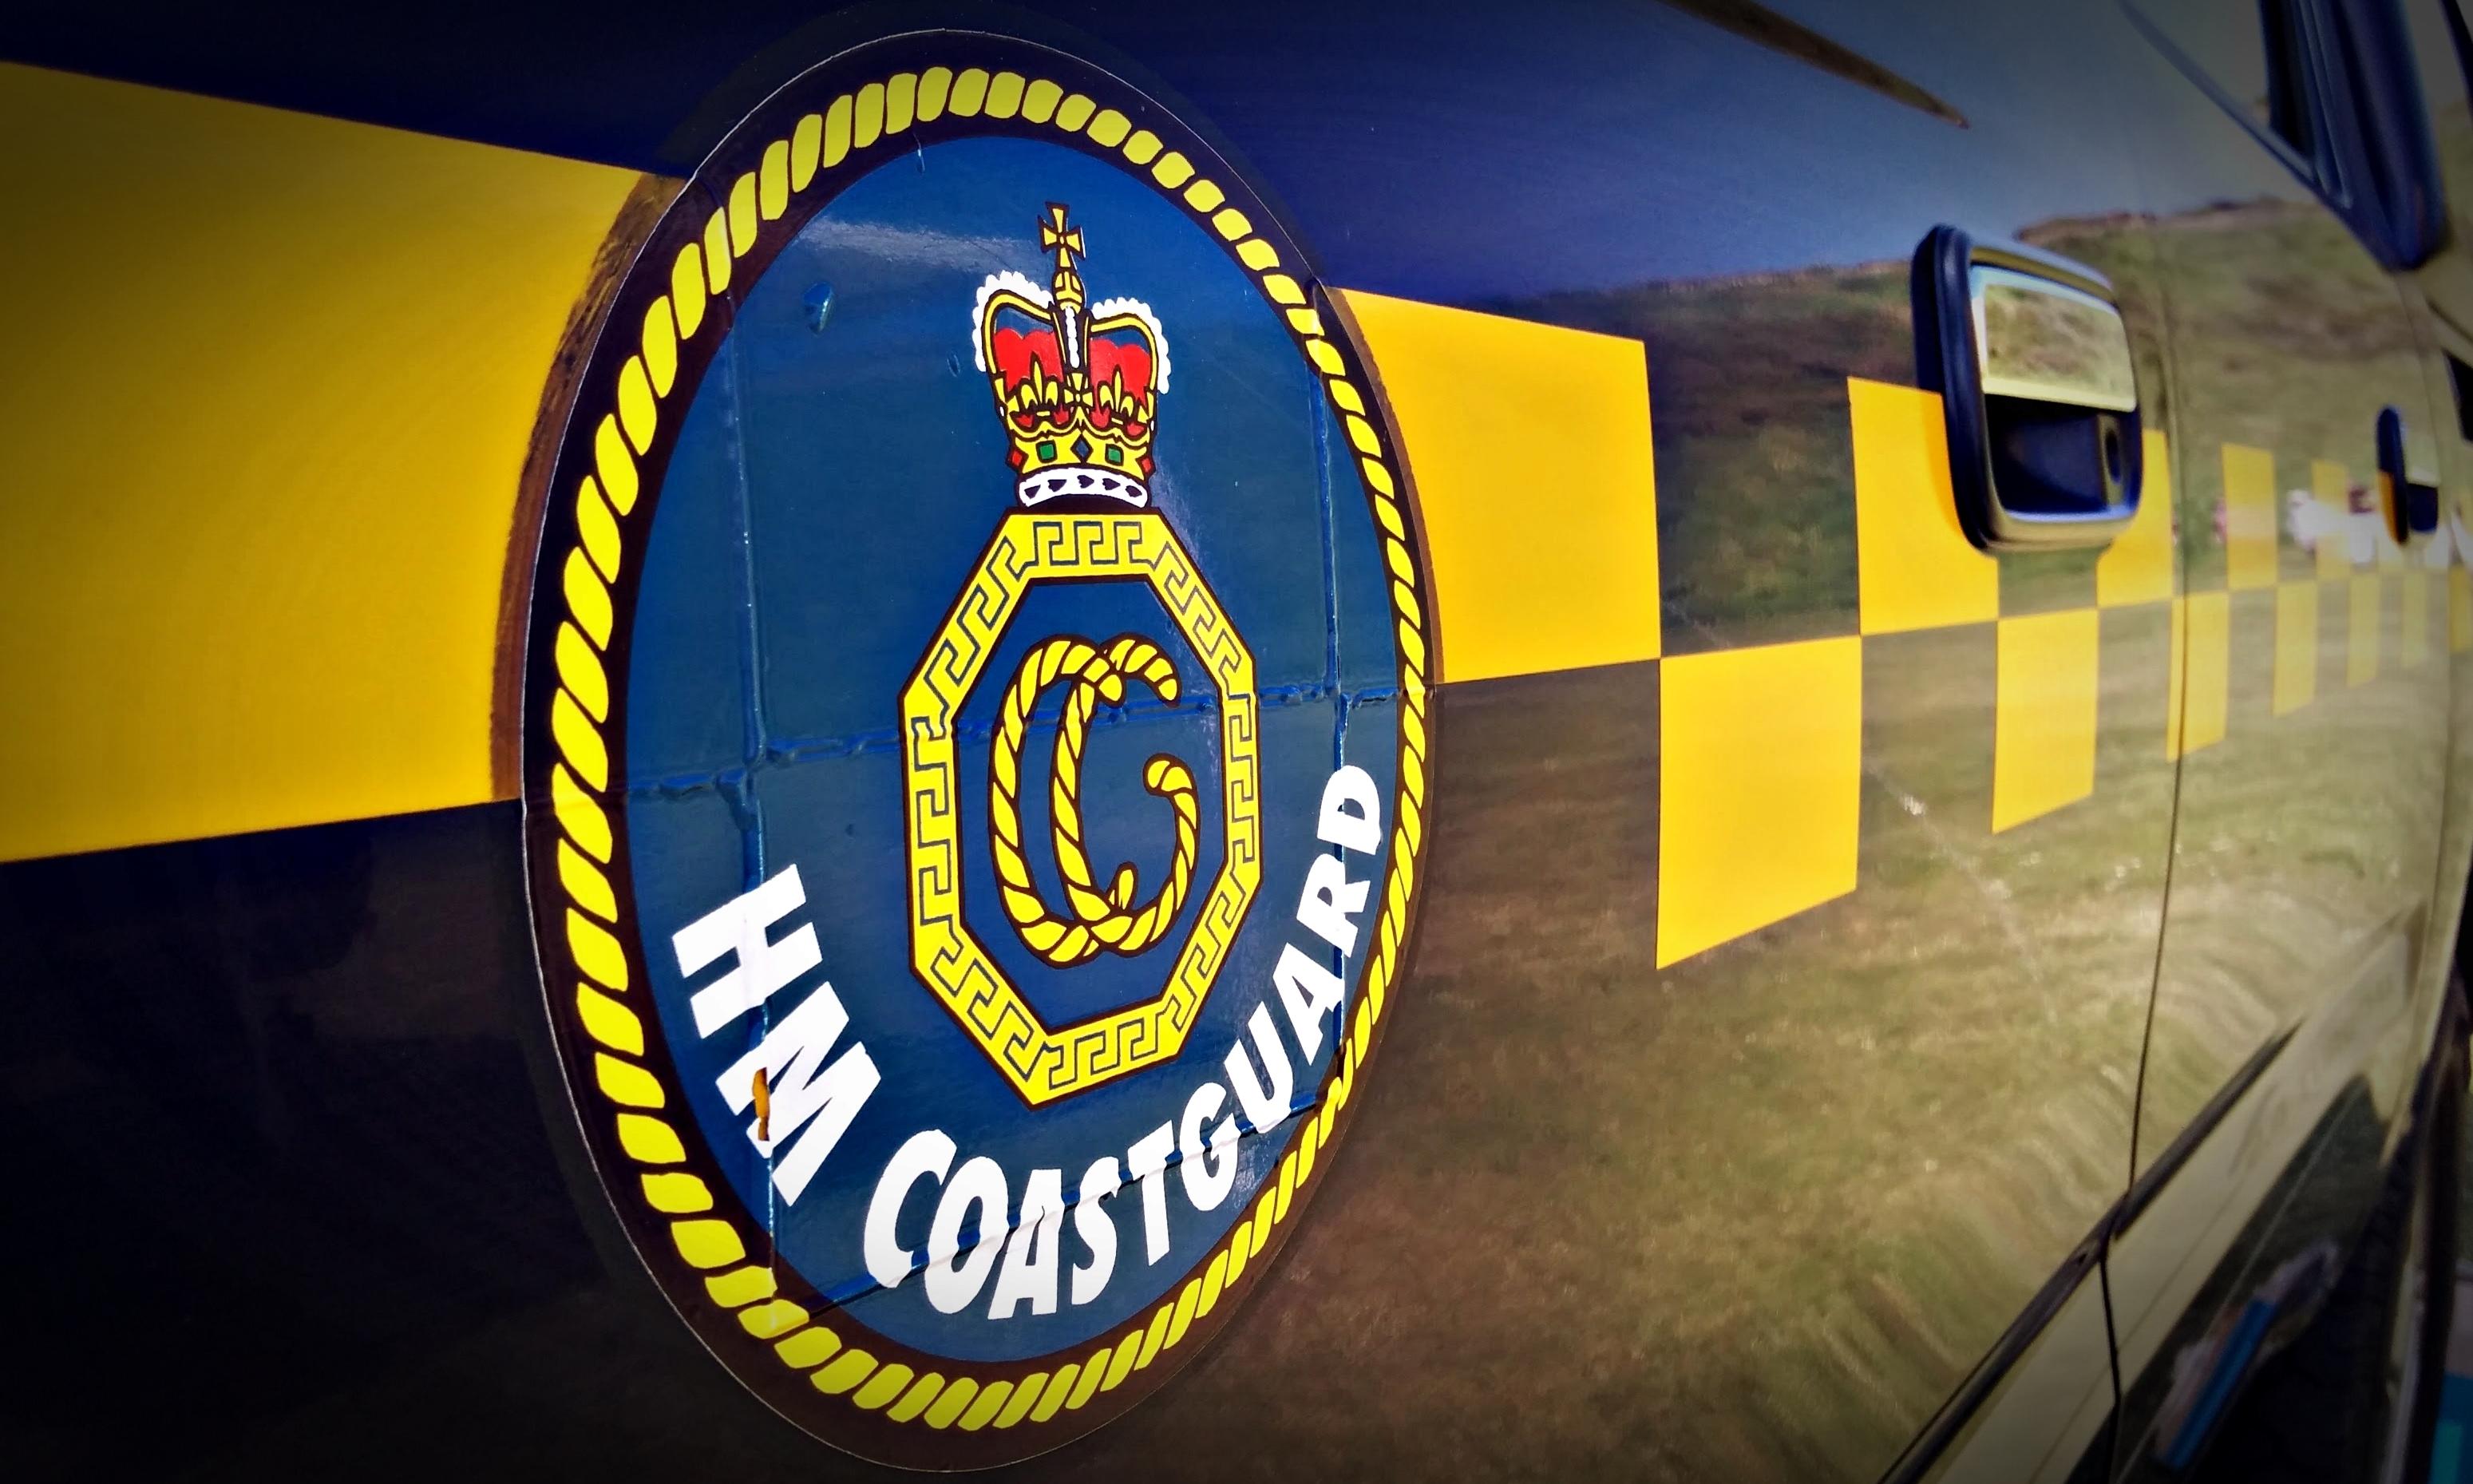 HM Coastguard were called